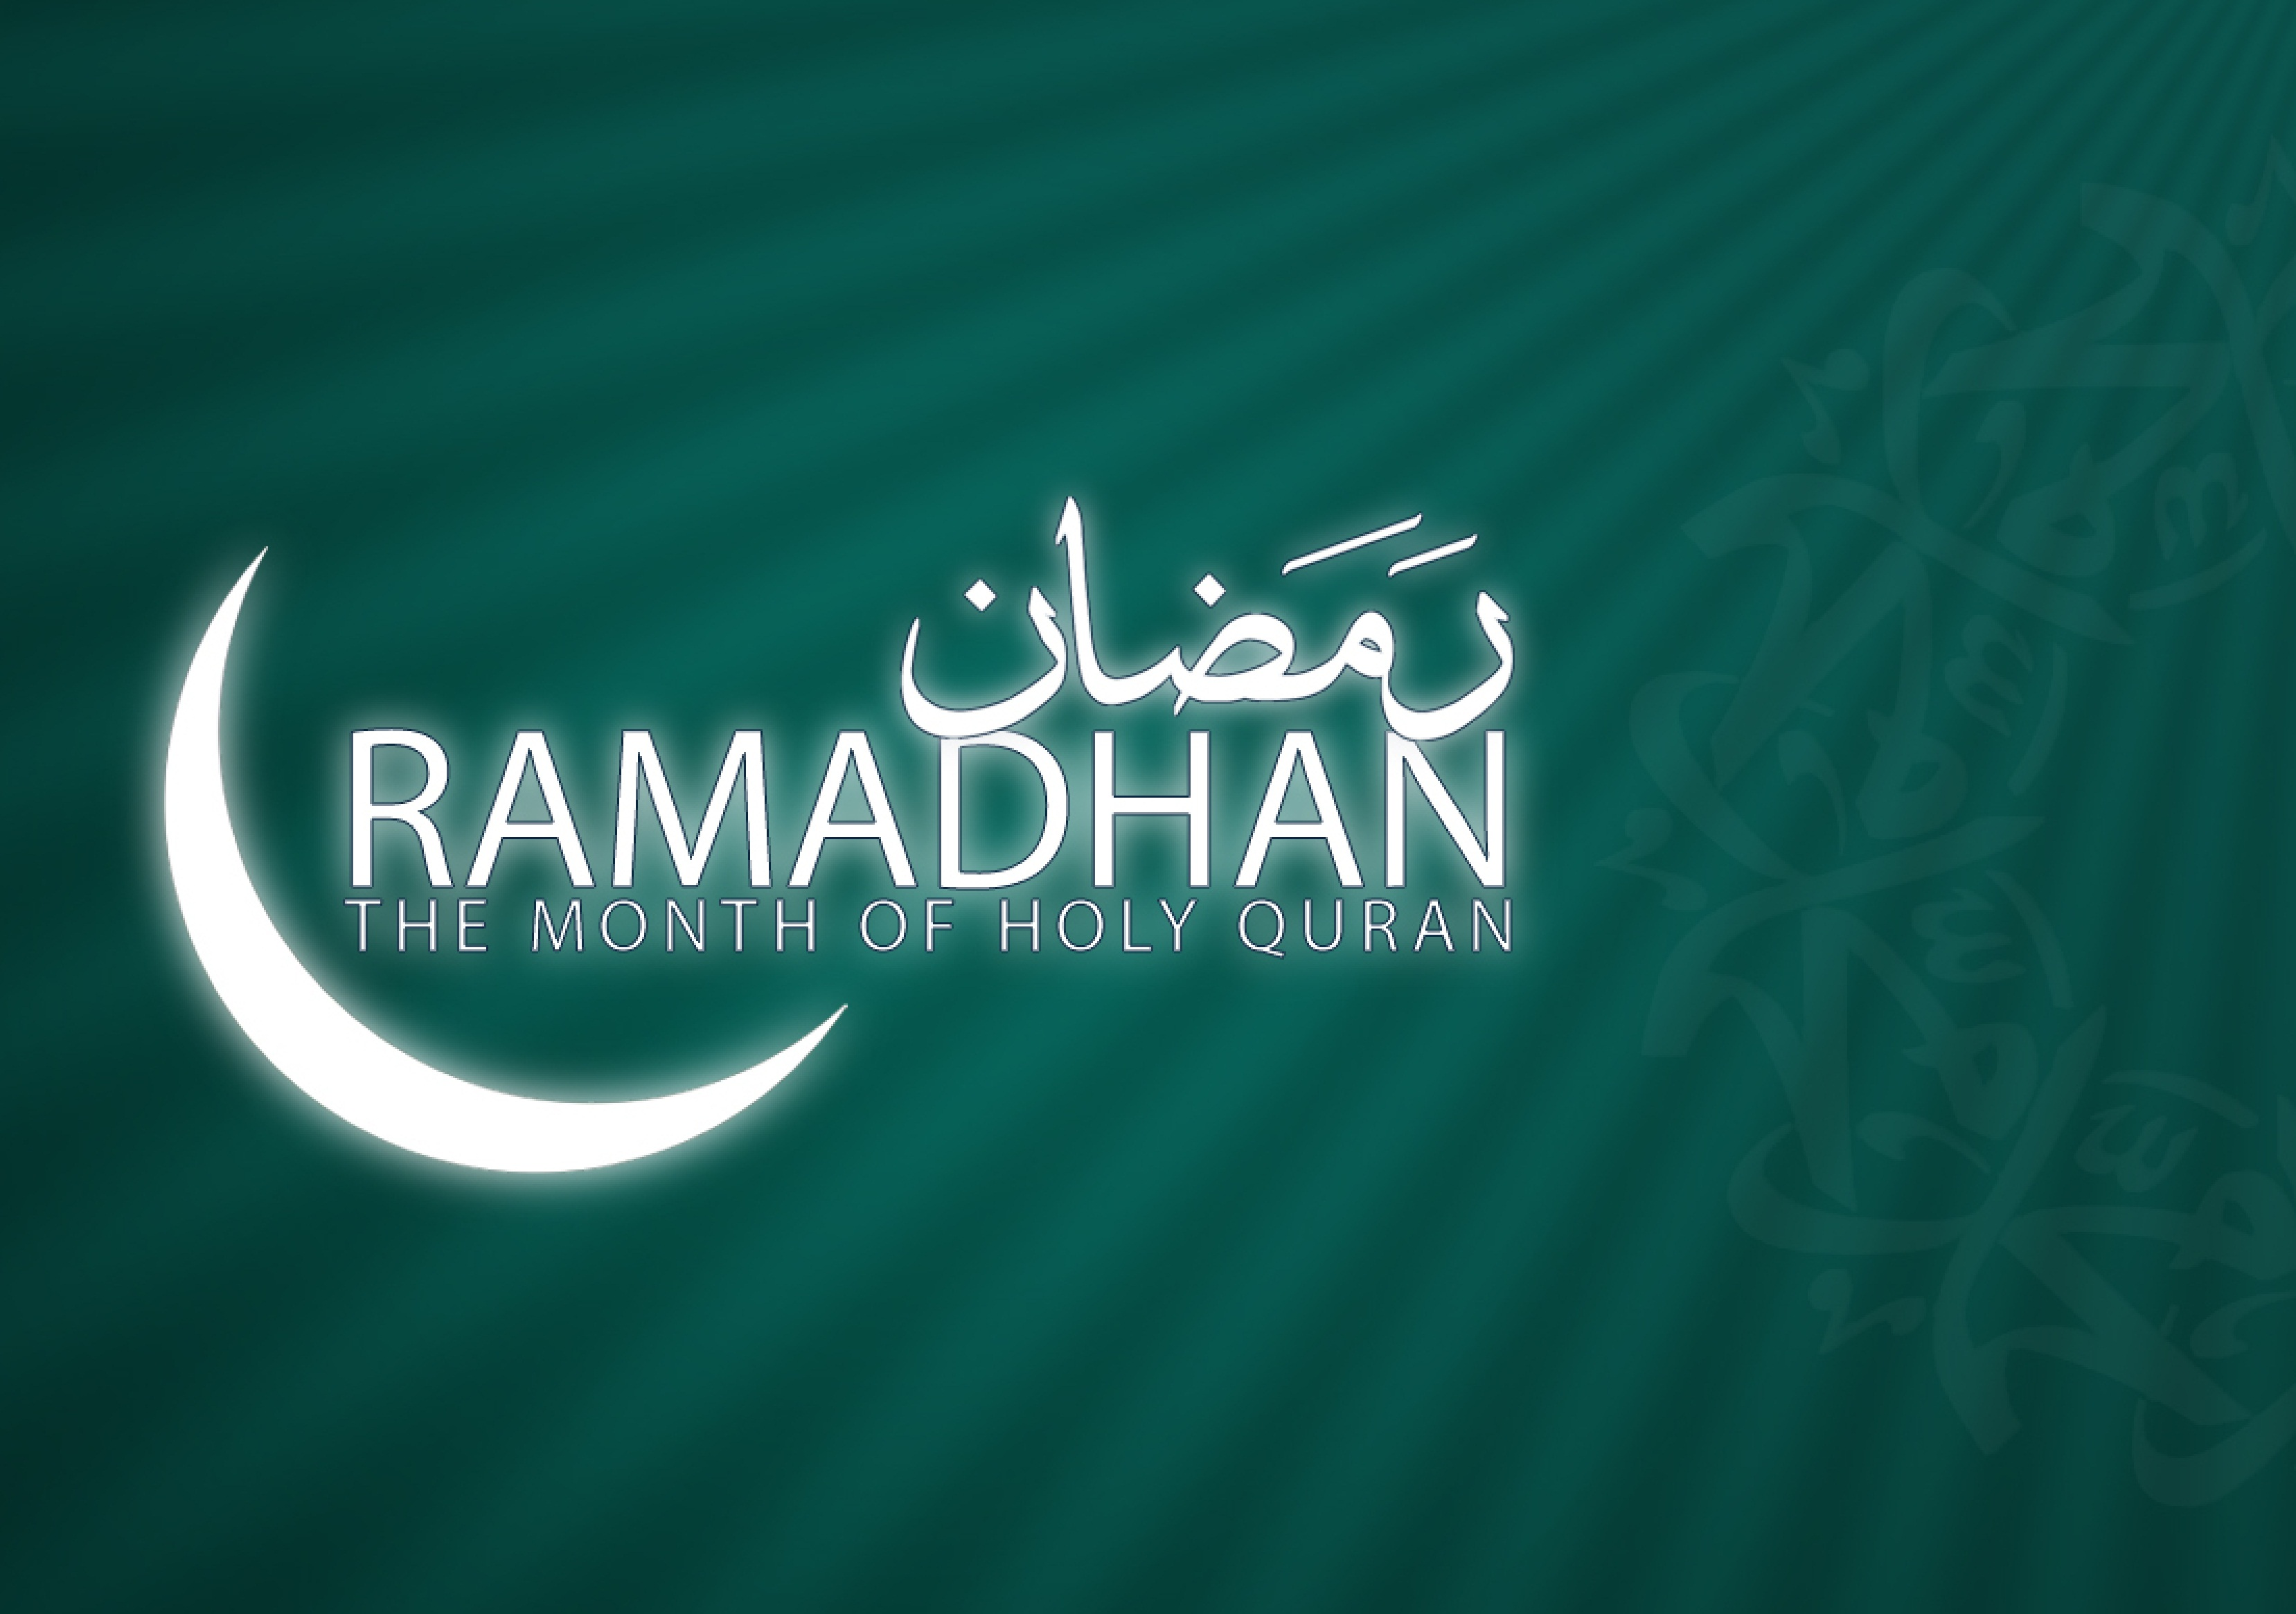 10 Cara Menyambut Datangnya Bulan Suci Ramadhan Uceng Blog